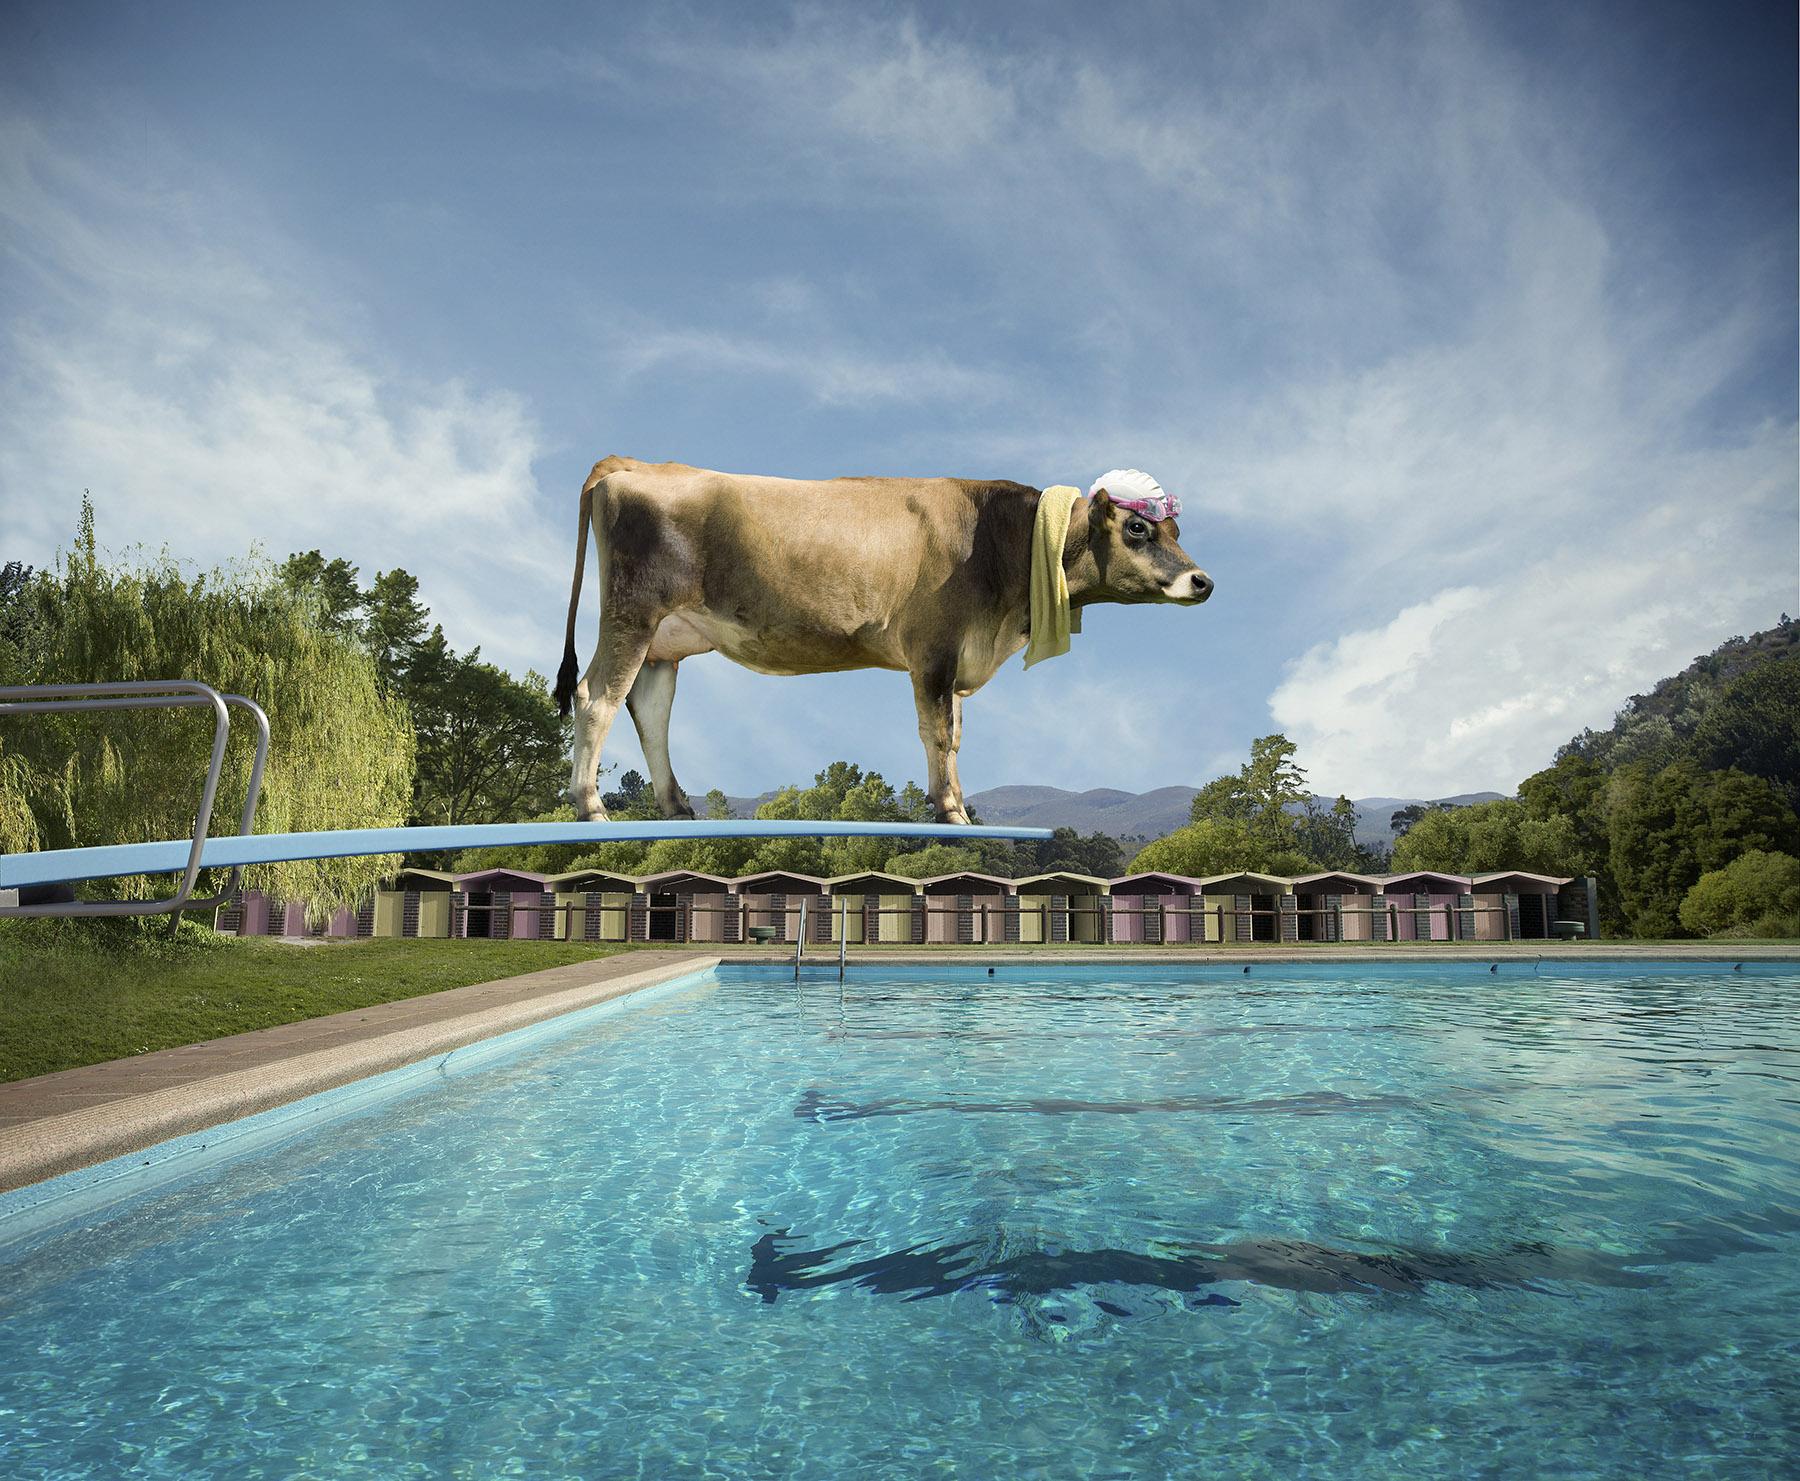 Cow_Diving_Board6sh